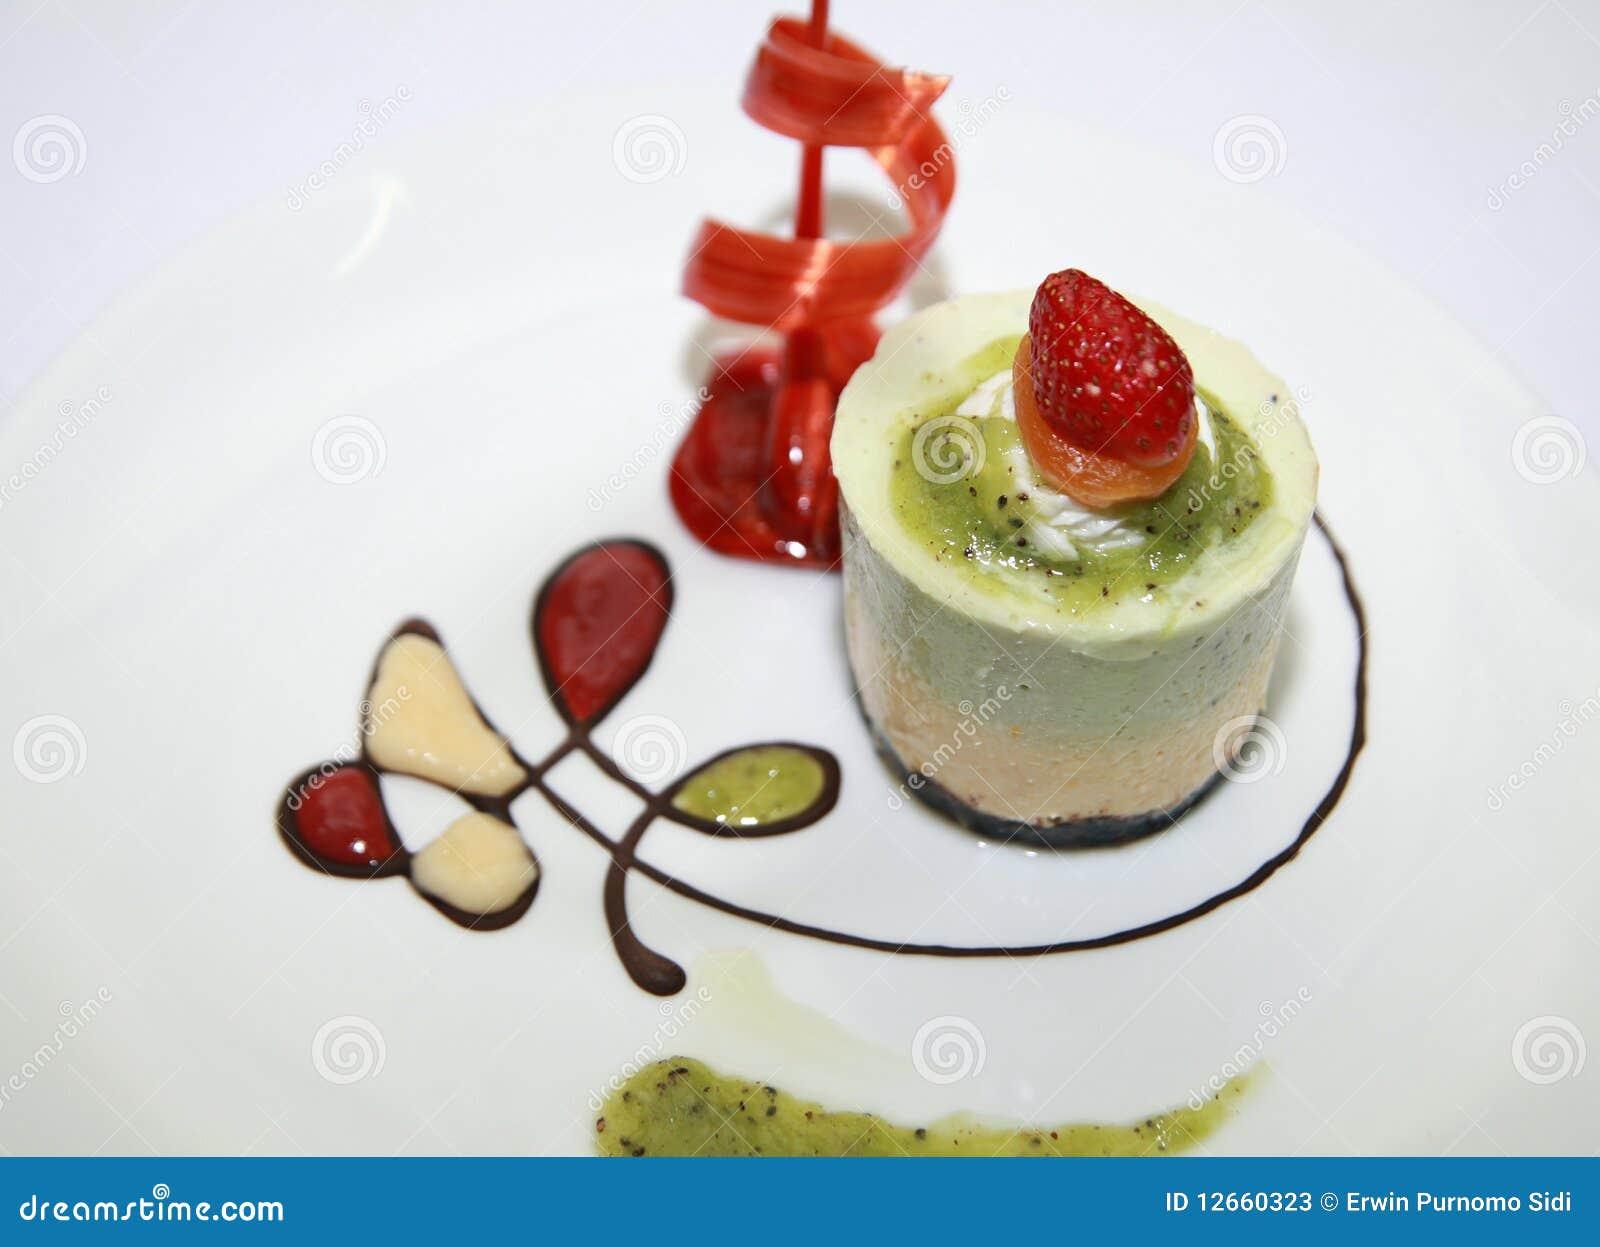 Dessert Mouse Cake Royalty Free Stock Photos - Image: 12660288